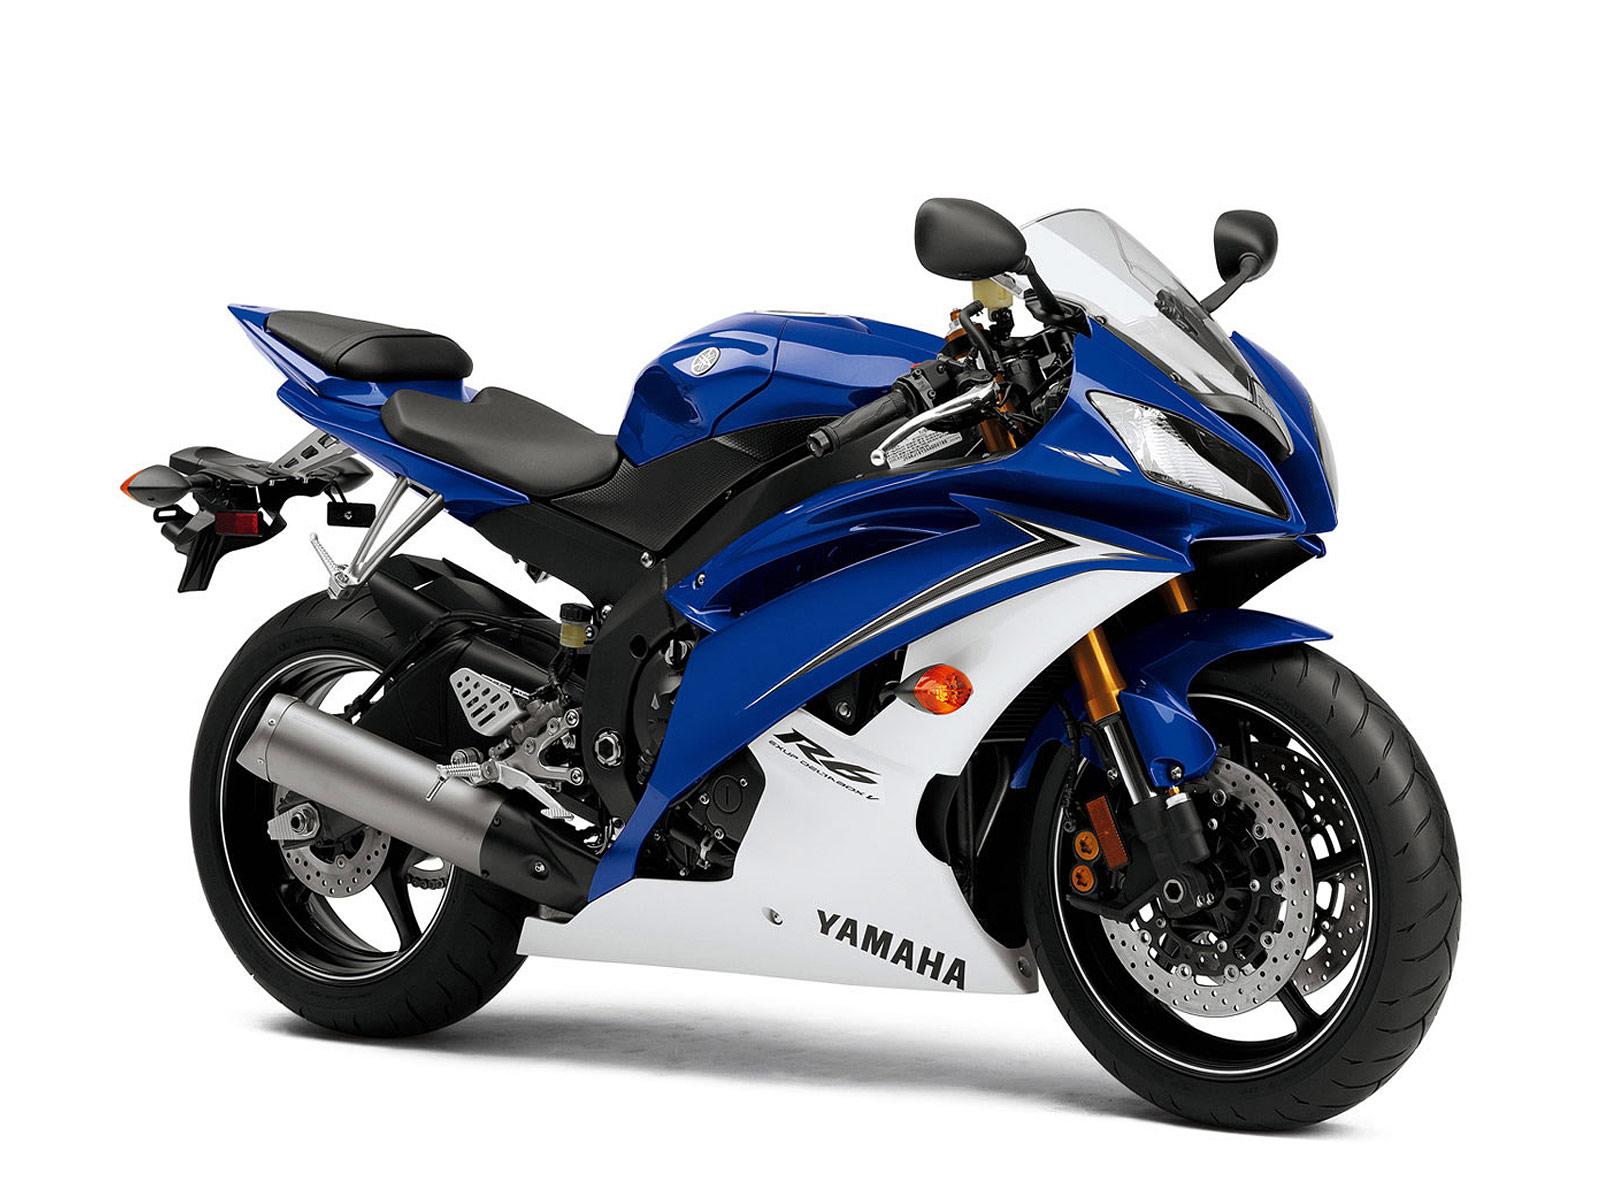 Harley davidson motorcycles today yamaha yzf r6 2010 for Yamaha r6 motorcycle